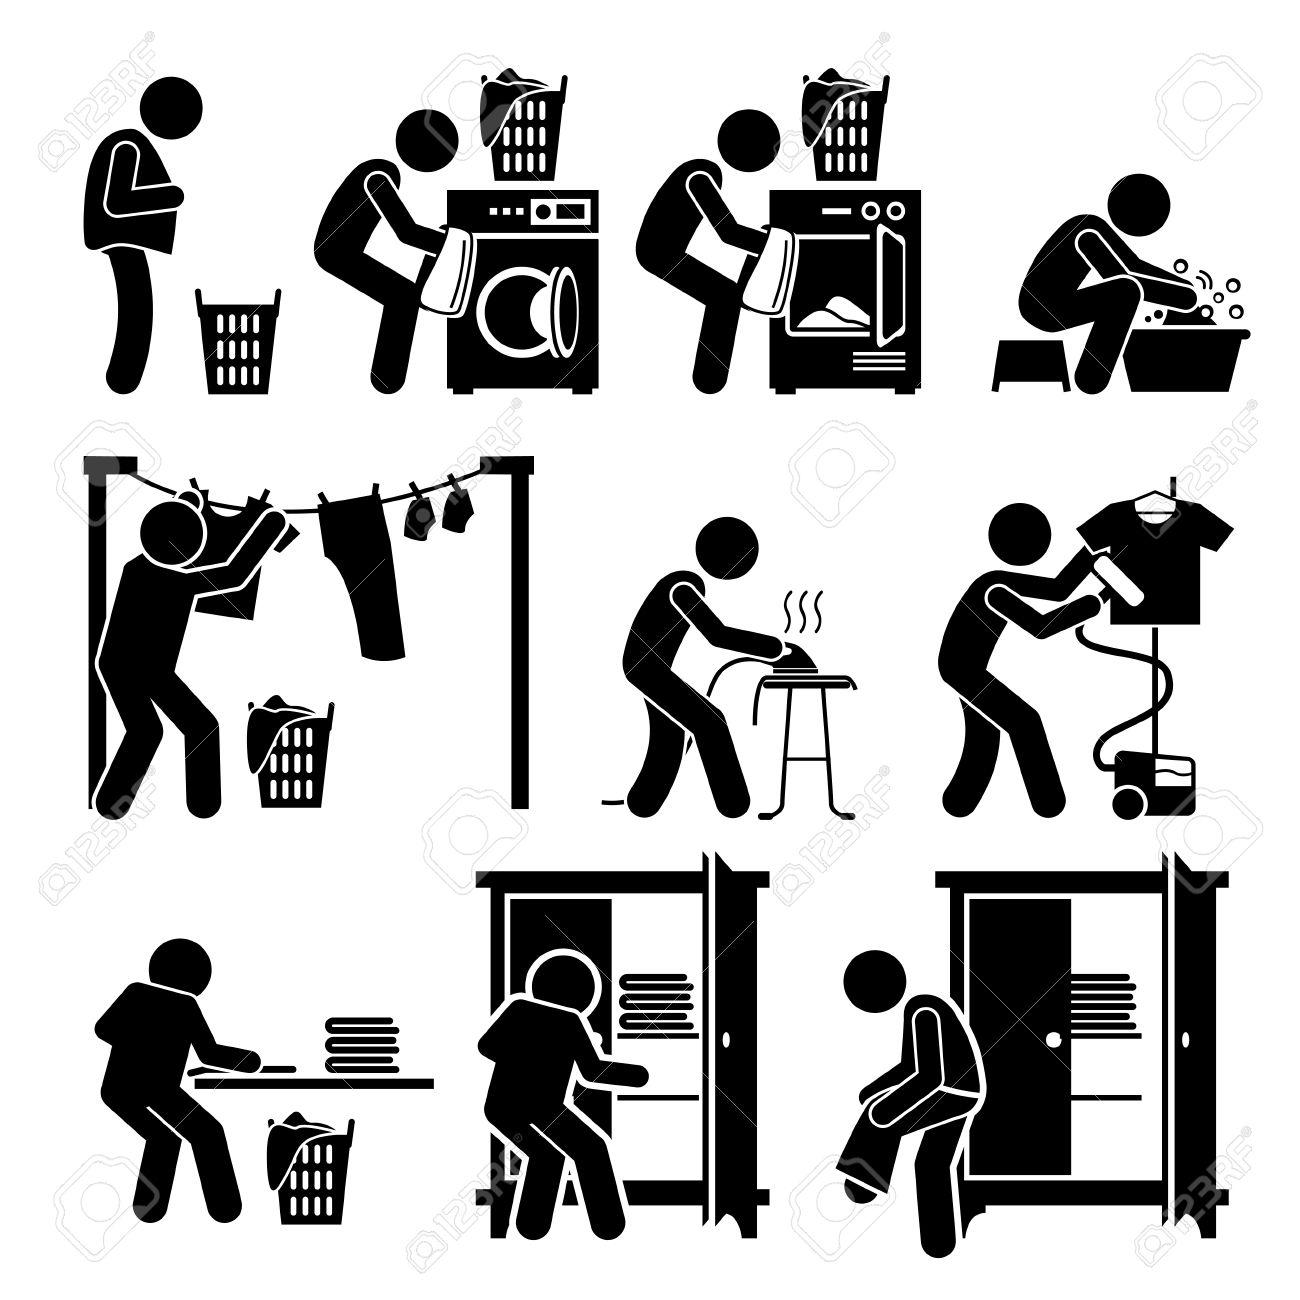 Laundry Works Washing Clothes Pictogram - 53802610